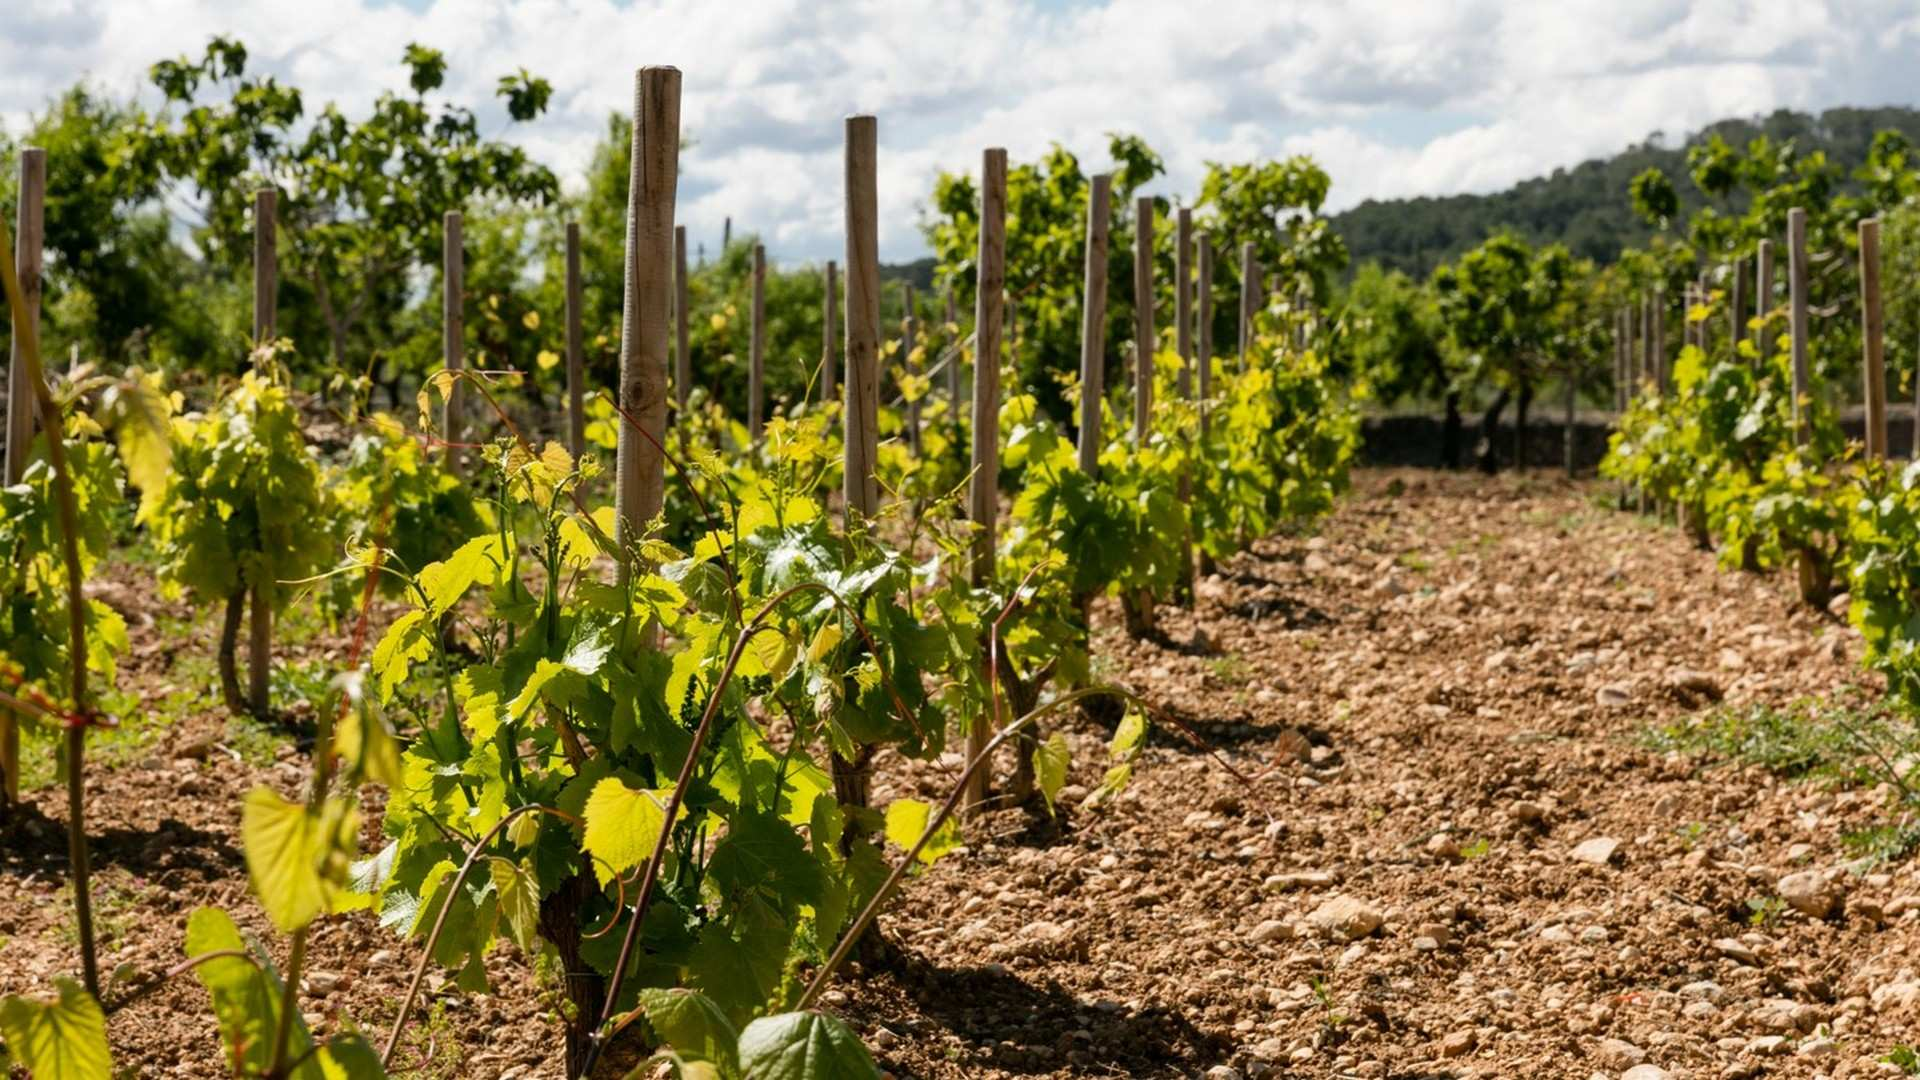 Vinos de Mallorca: el secreto mejor guardado de la isla